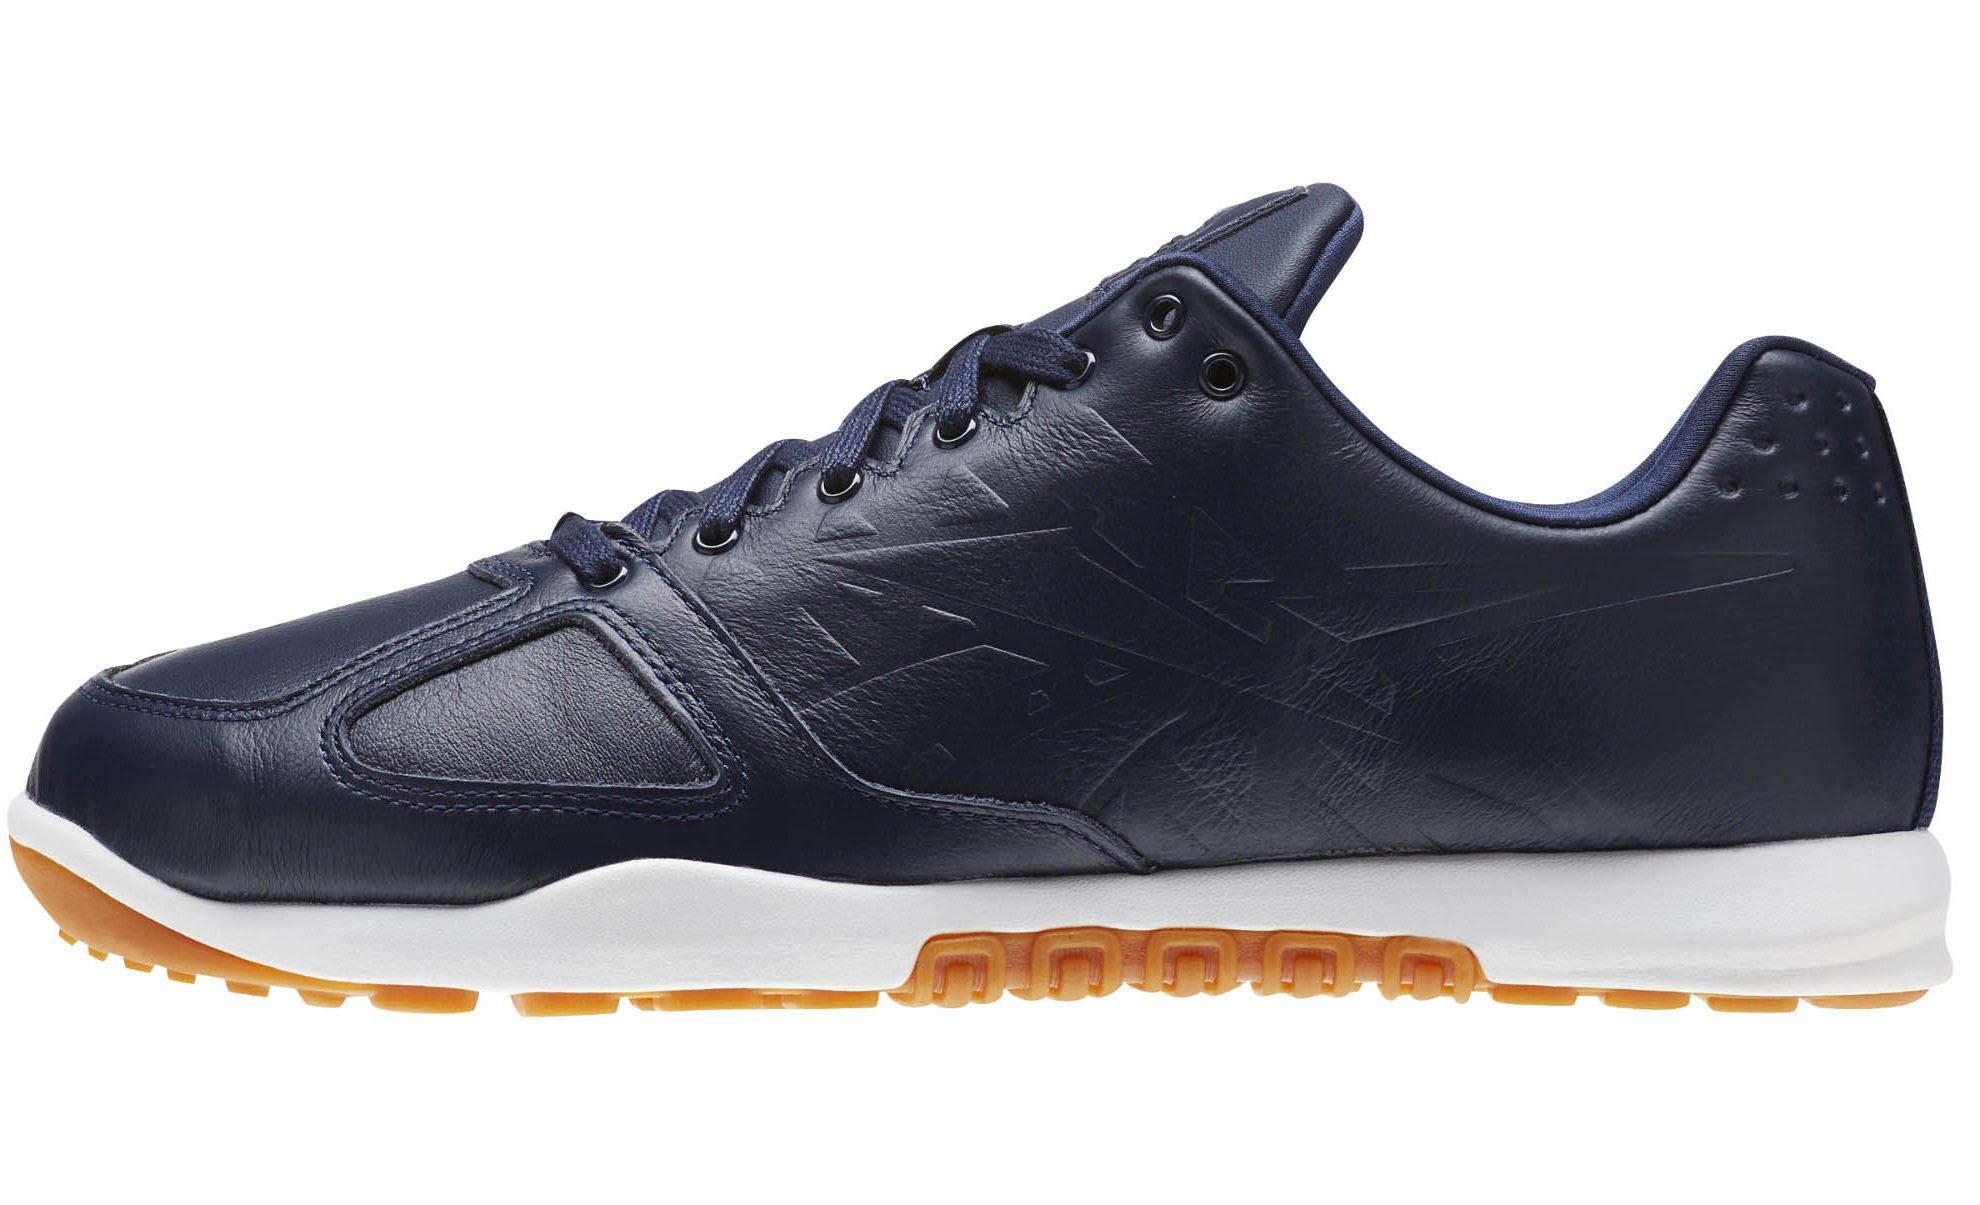 Reebok Crossfit nano sneaker